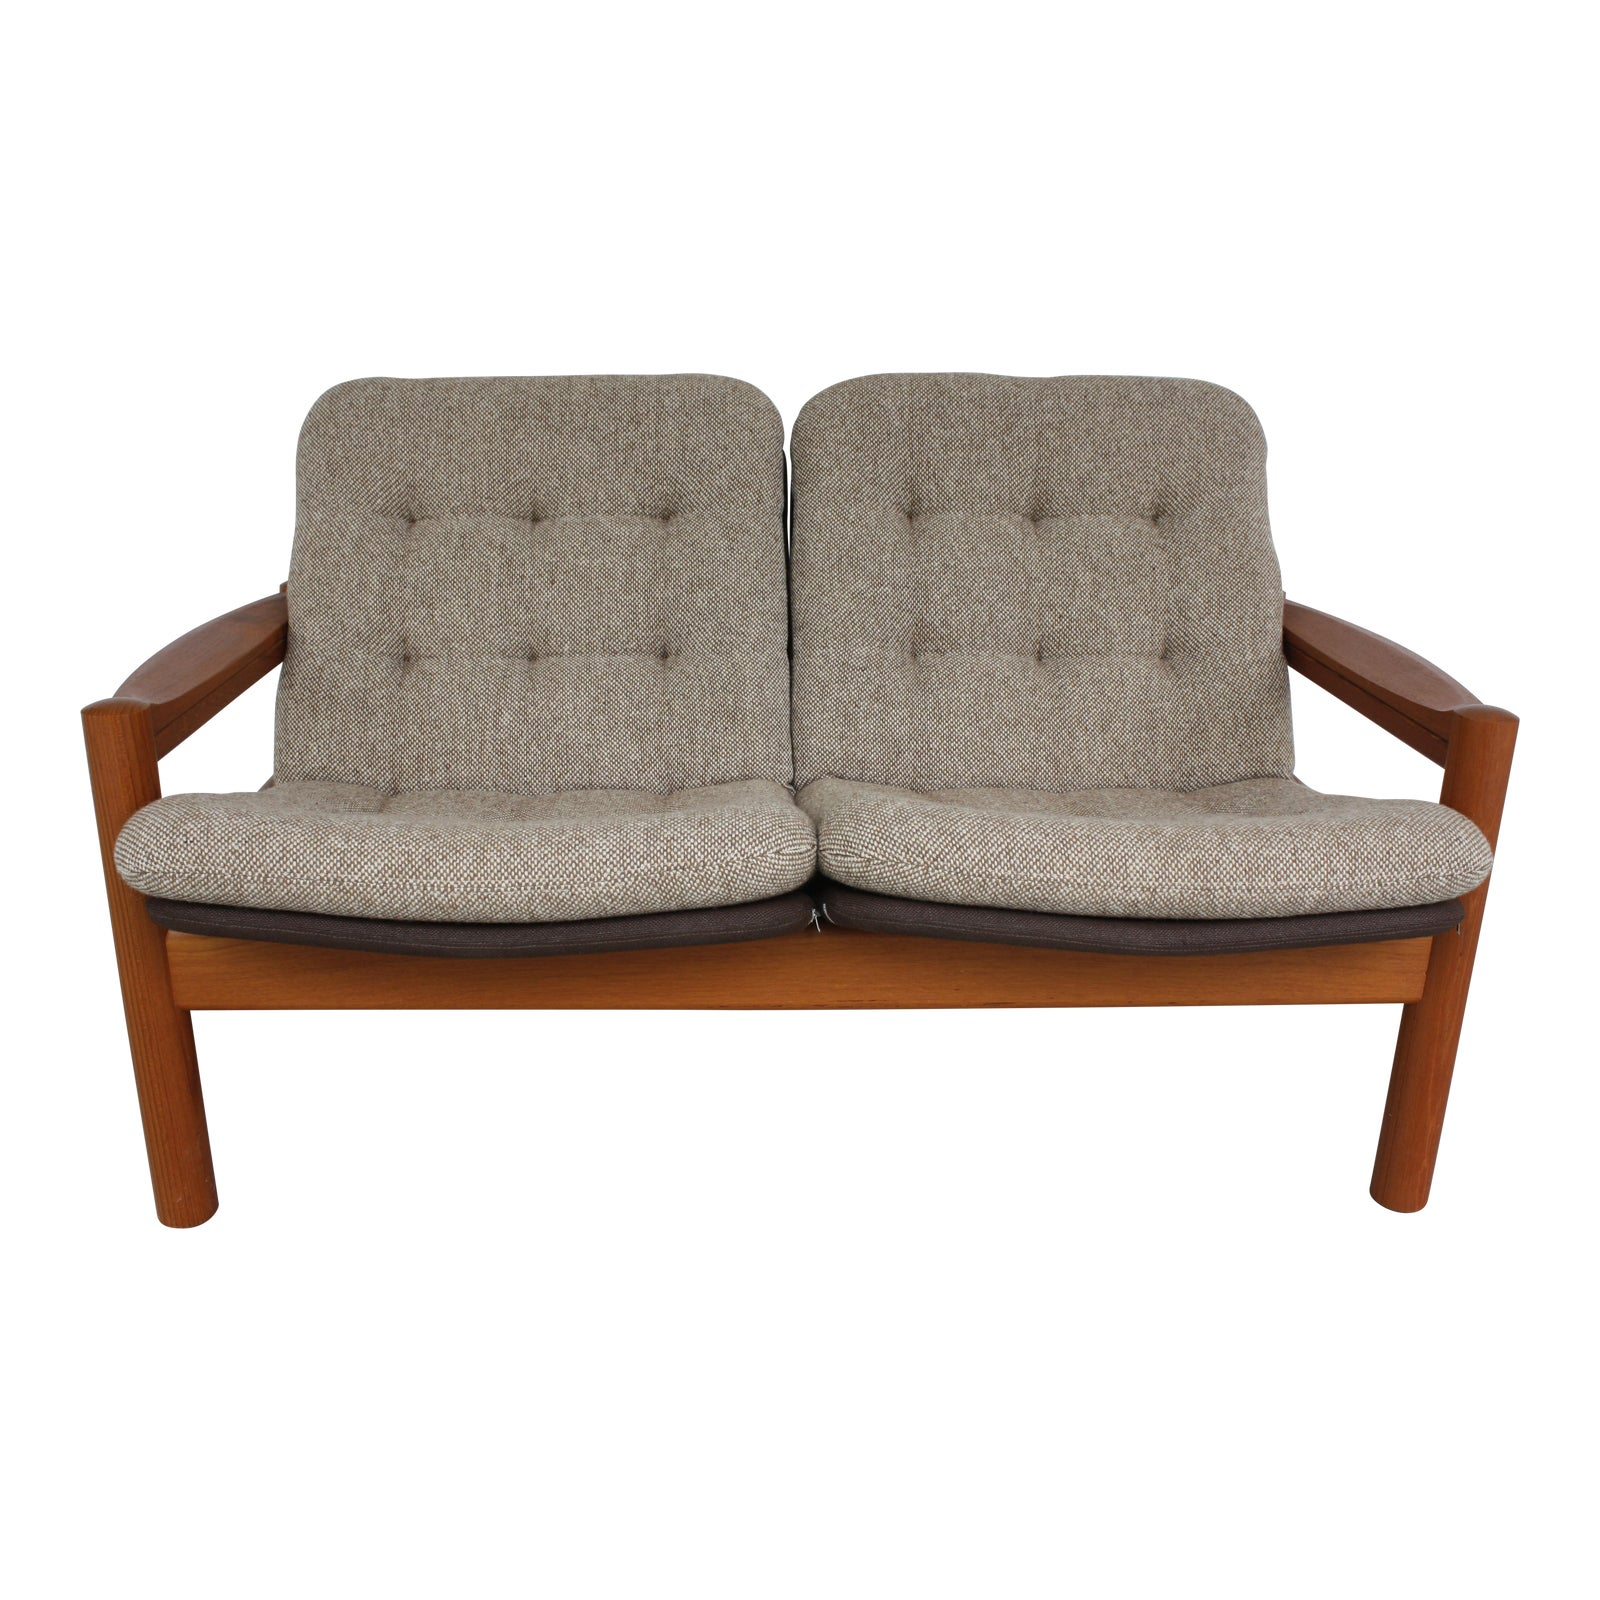 seagreen furniture sofas sea home room collection decorators sofa green loveseat n petite living emma velvet loveseats b